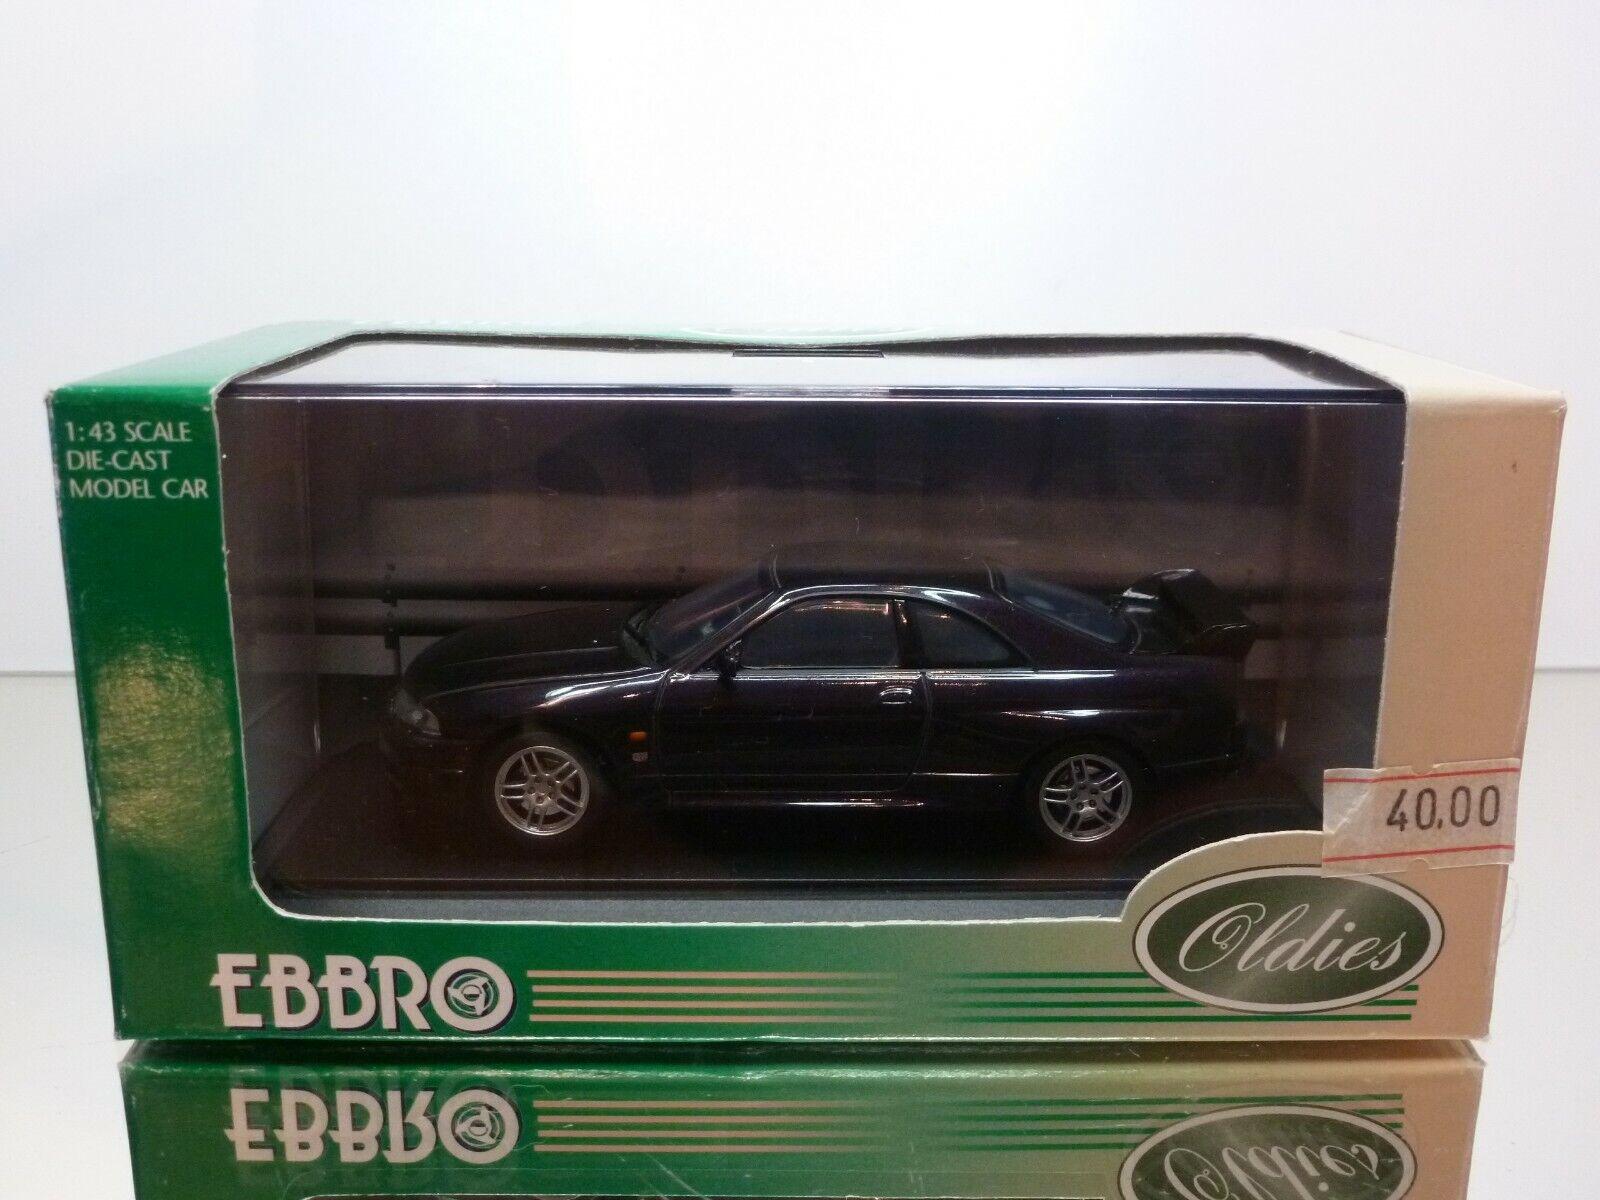 EBBRO 154 NISSAN SKYLINE GT-R R33 - MIDNIGHT PURPLE 1 43 - EXCELLENT IN BOX